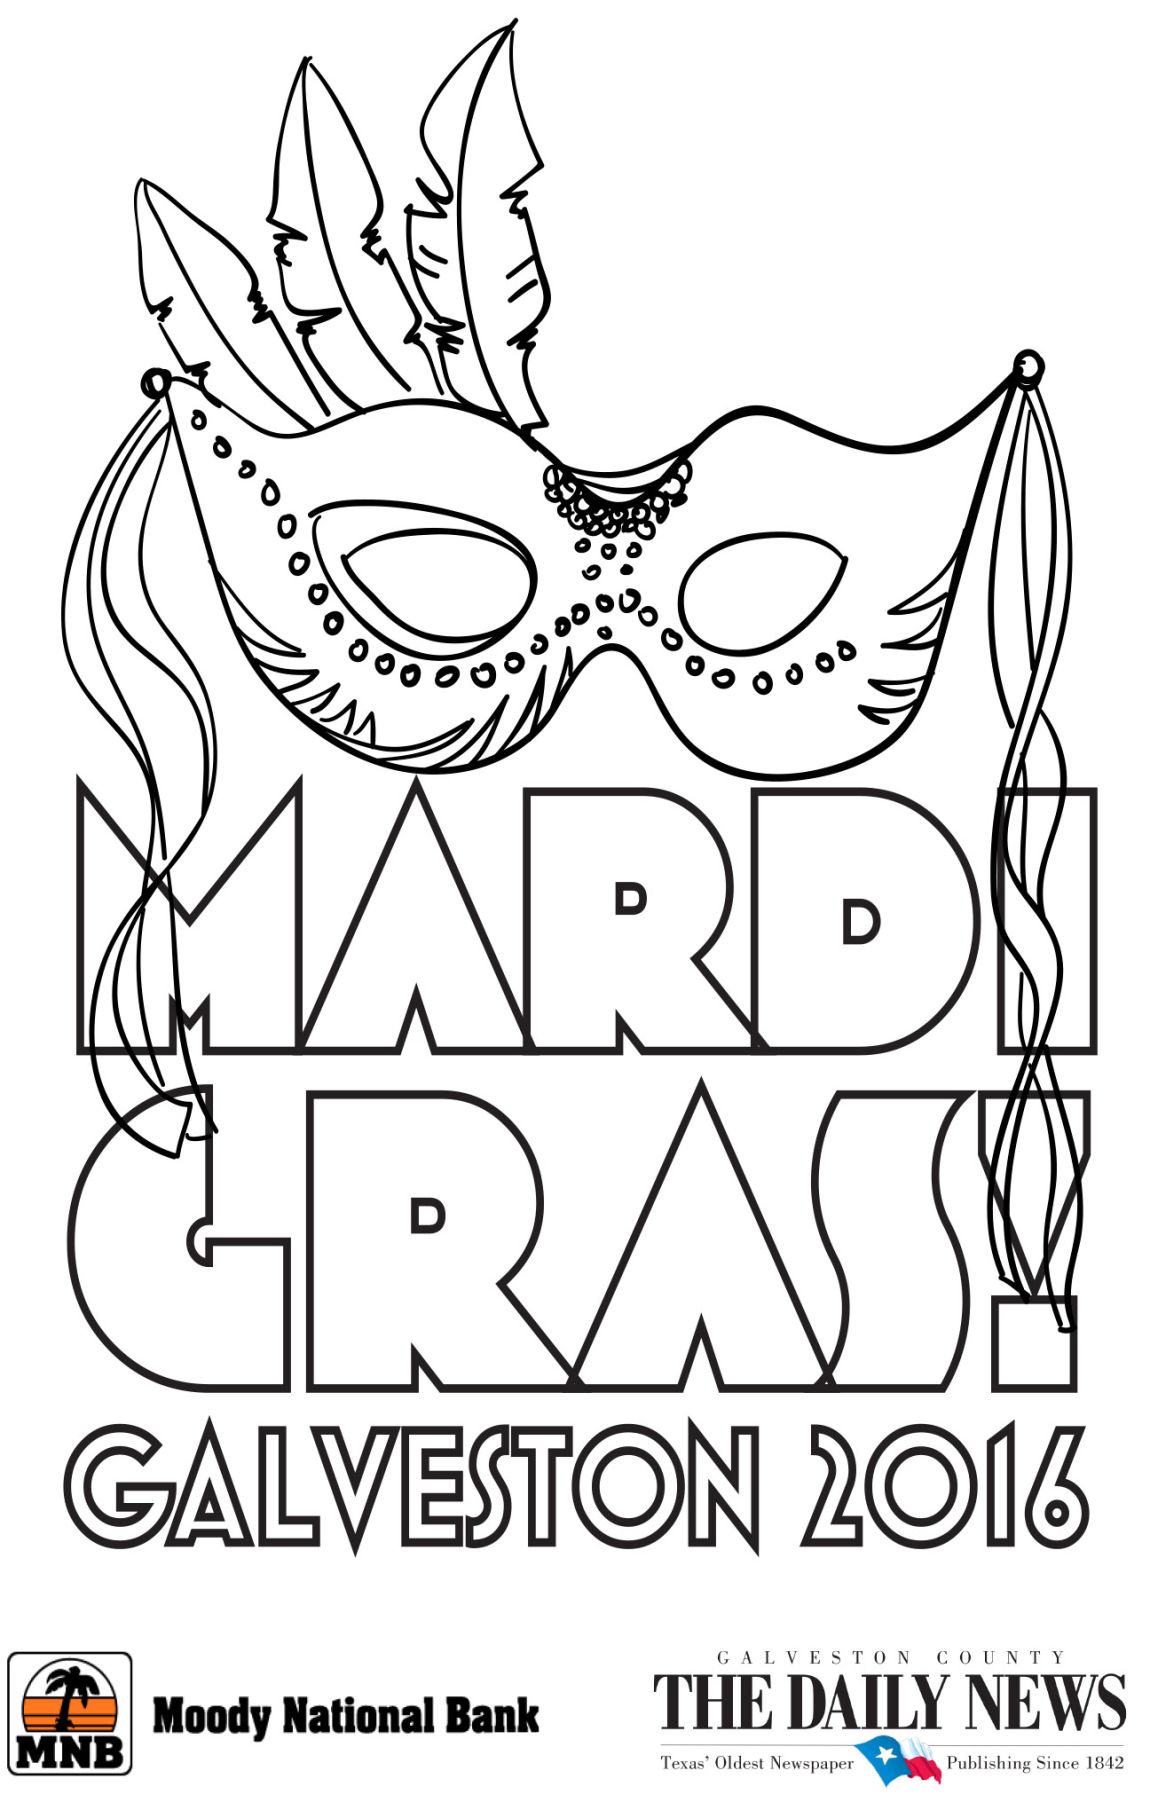 Mardi Gras Coloring Contest 2016 | Mardi Gras | The Daily News